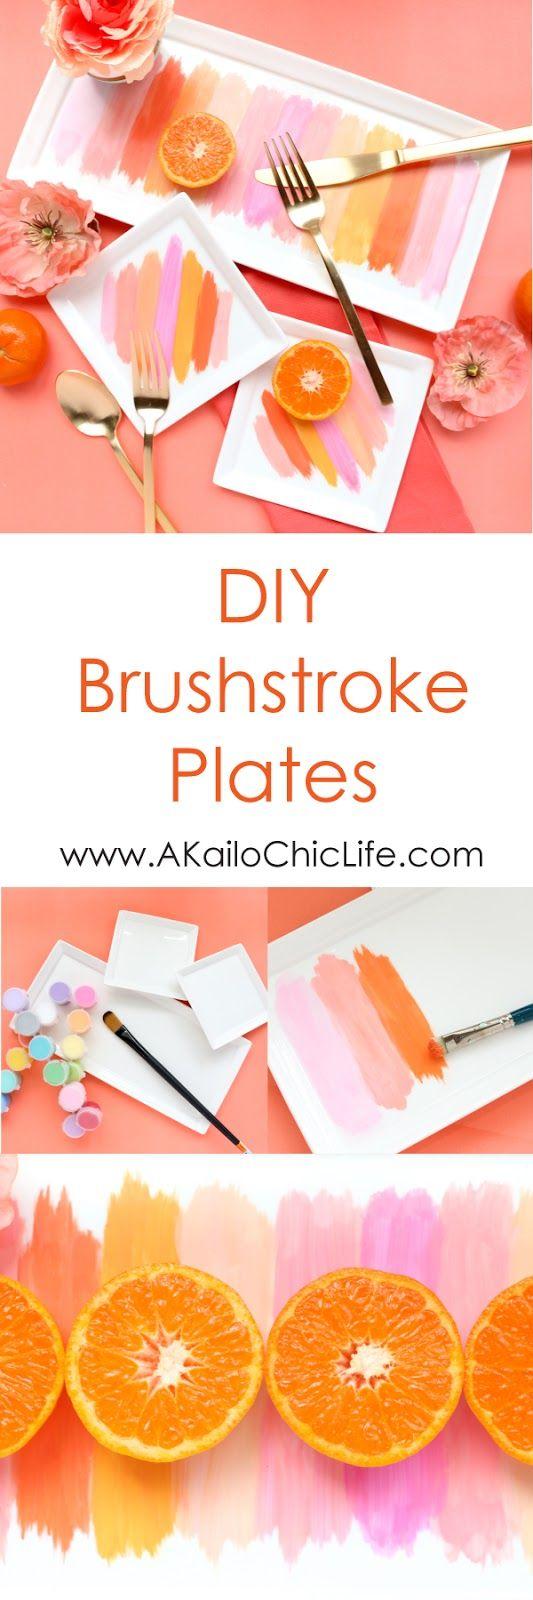 DIY Brushstrokes Plate.jpg